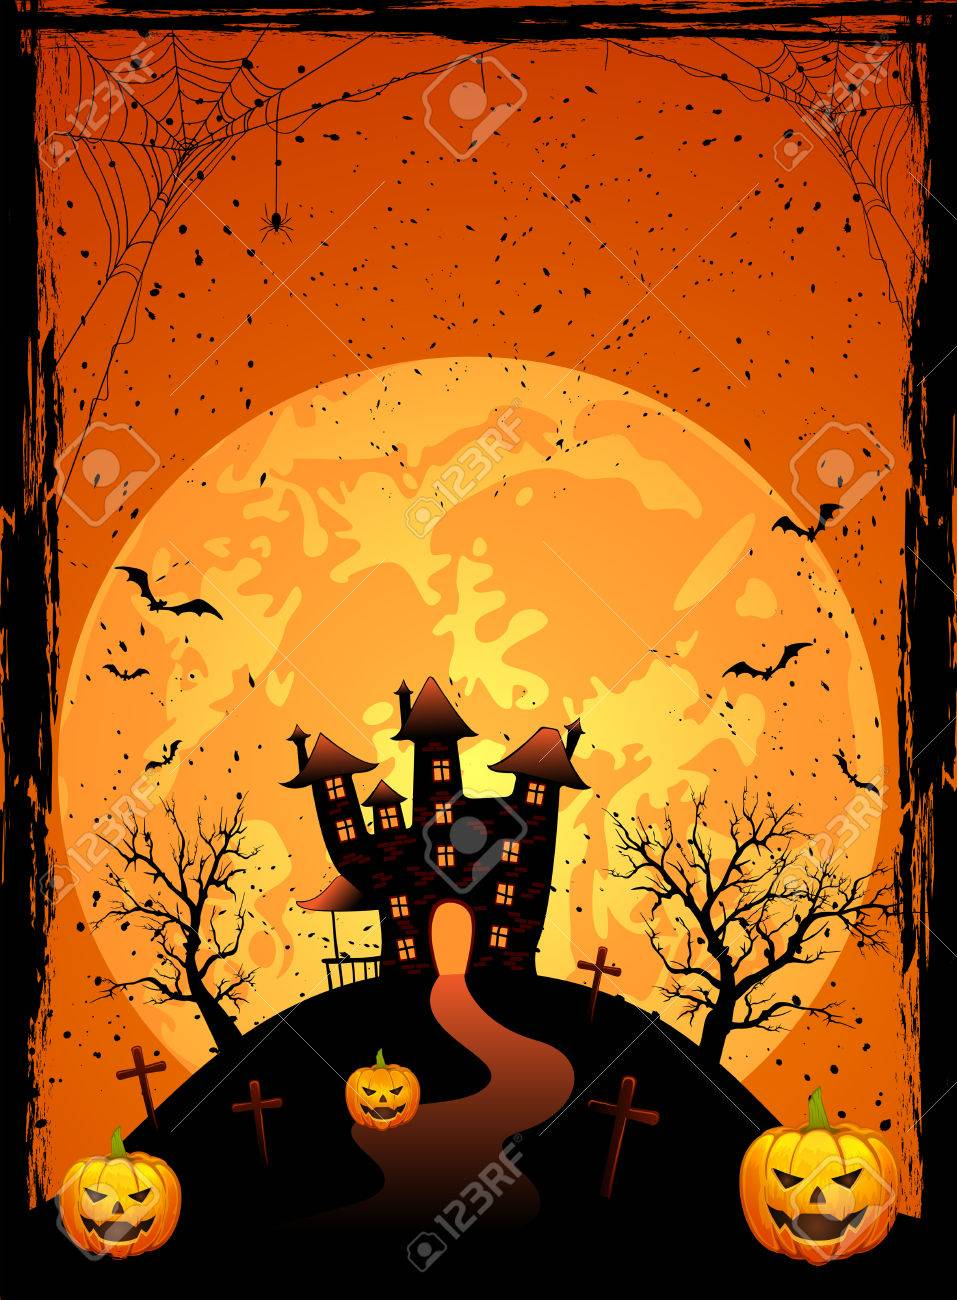 Halloween night, Scary House on the moon background, illustration Stock Vector - 22605493